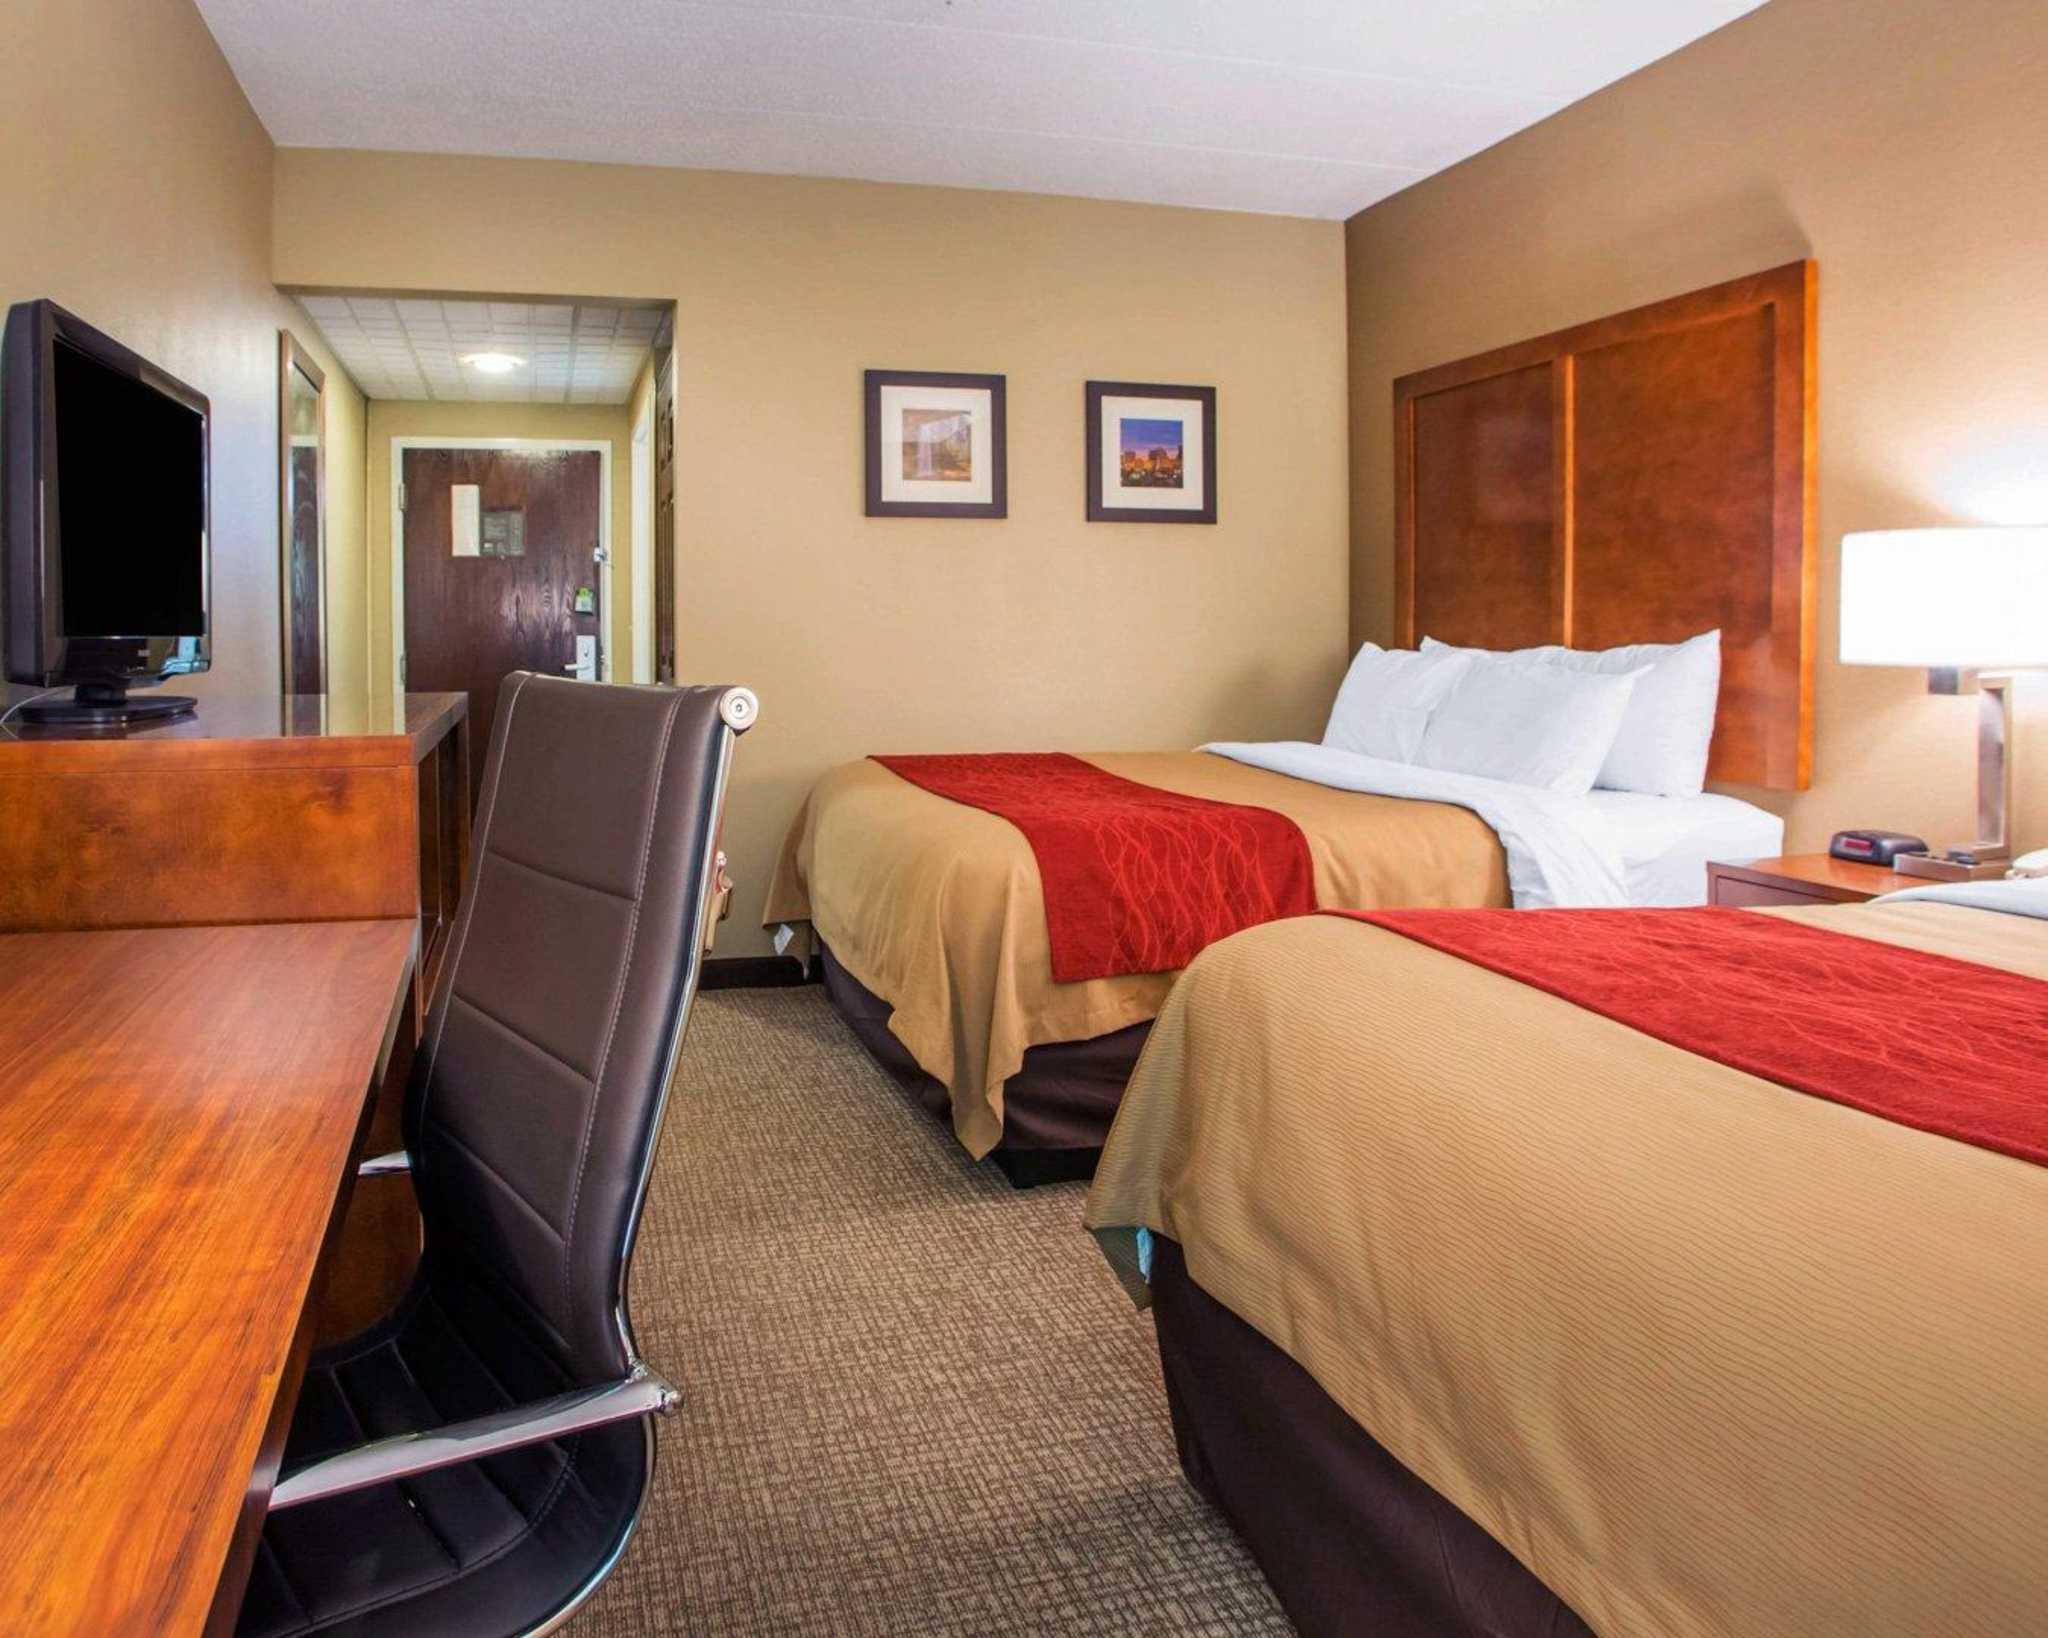 Comfort Inn Dayton - Huber Heights image 13